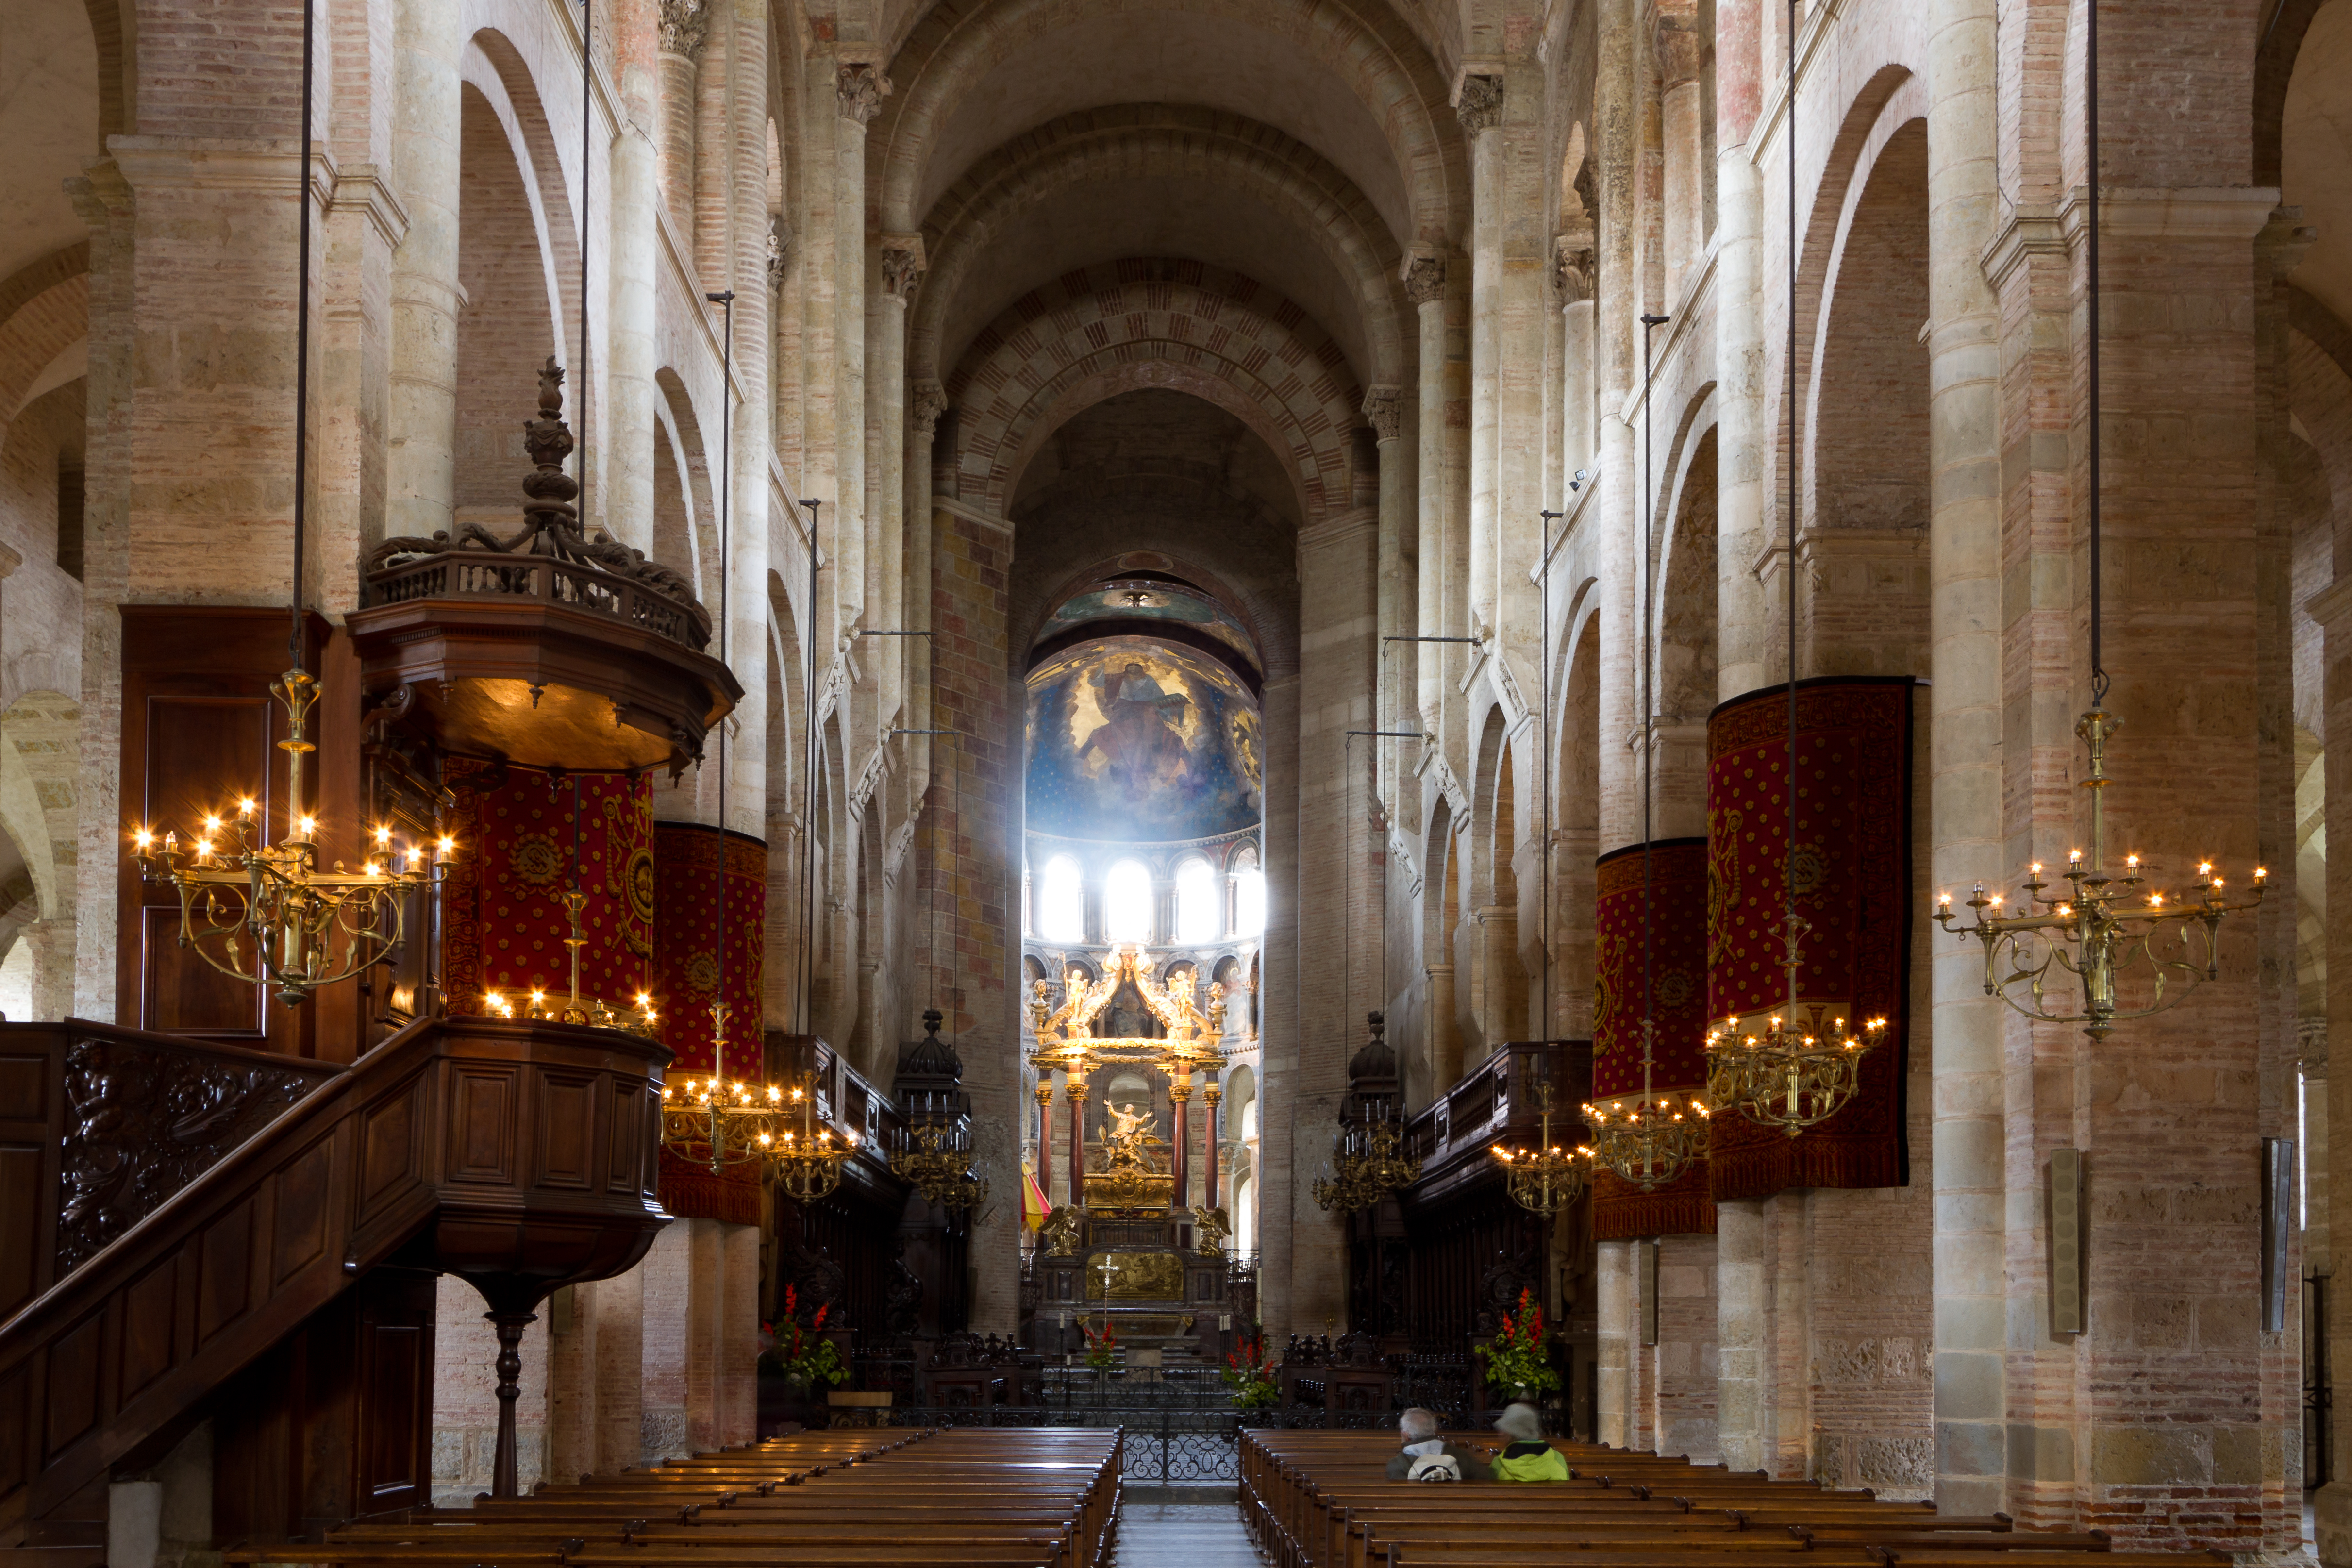 File:Interior of Basilica St Sernin - 2013-05-23.jpg ...